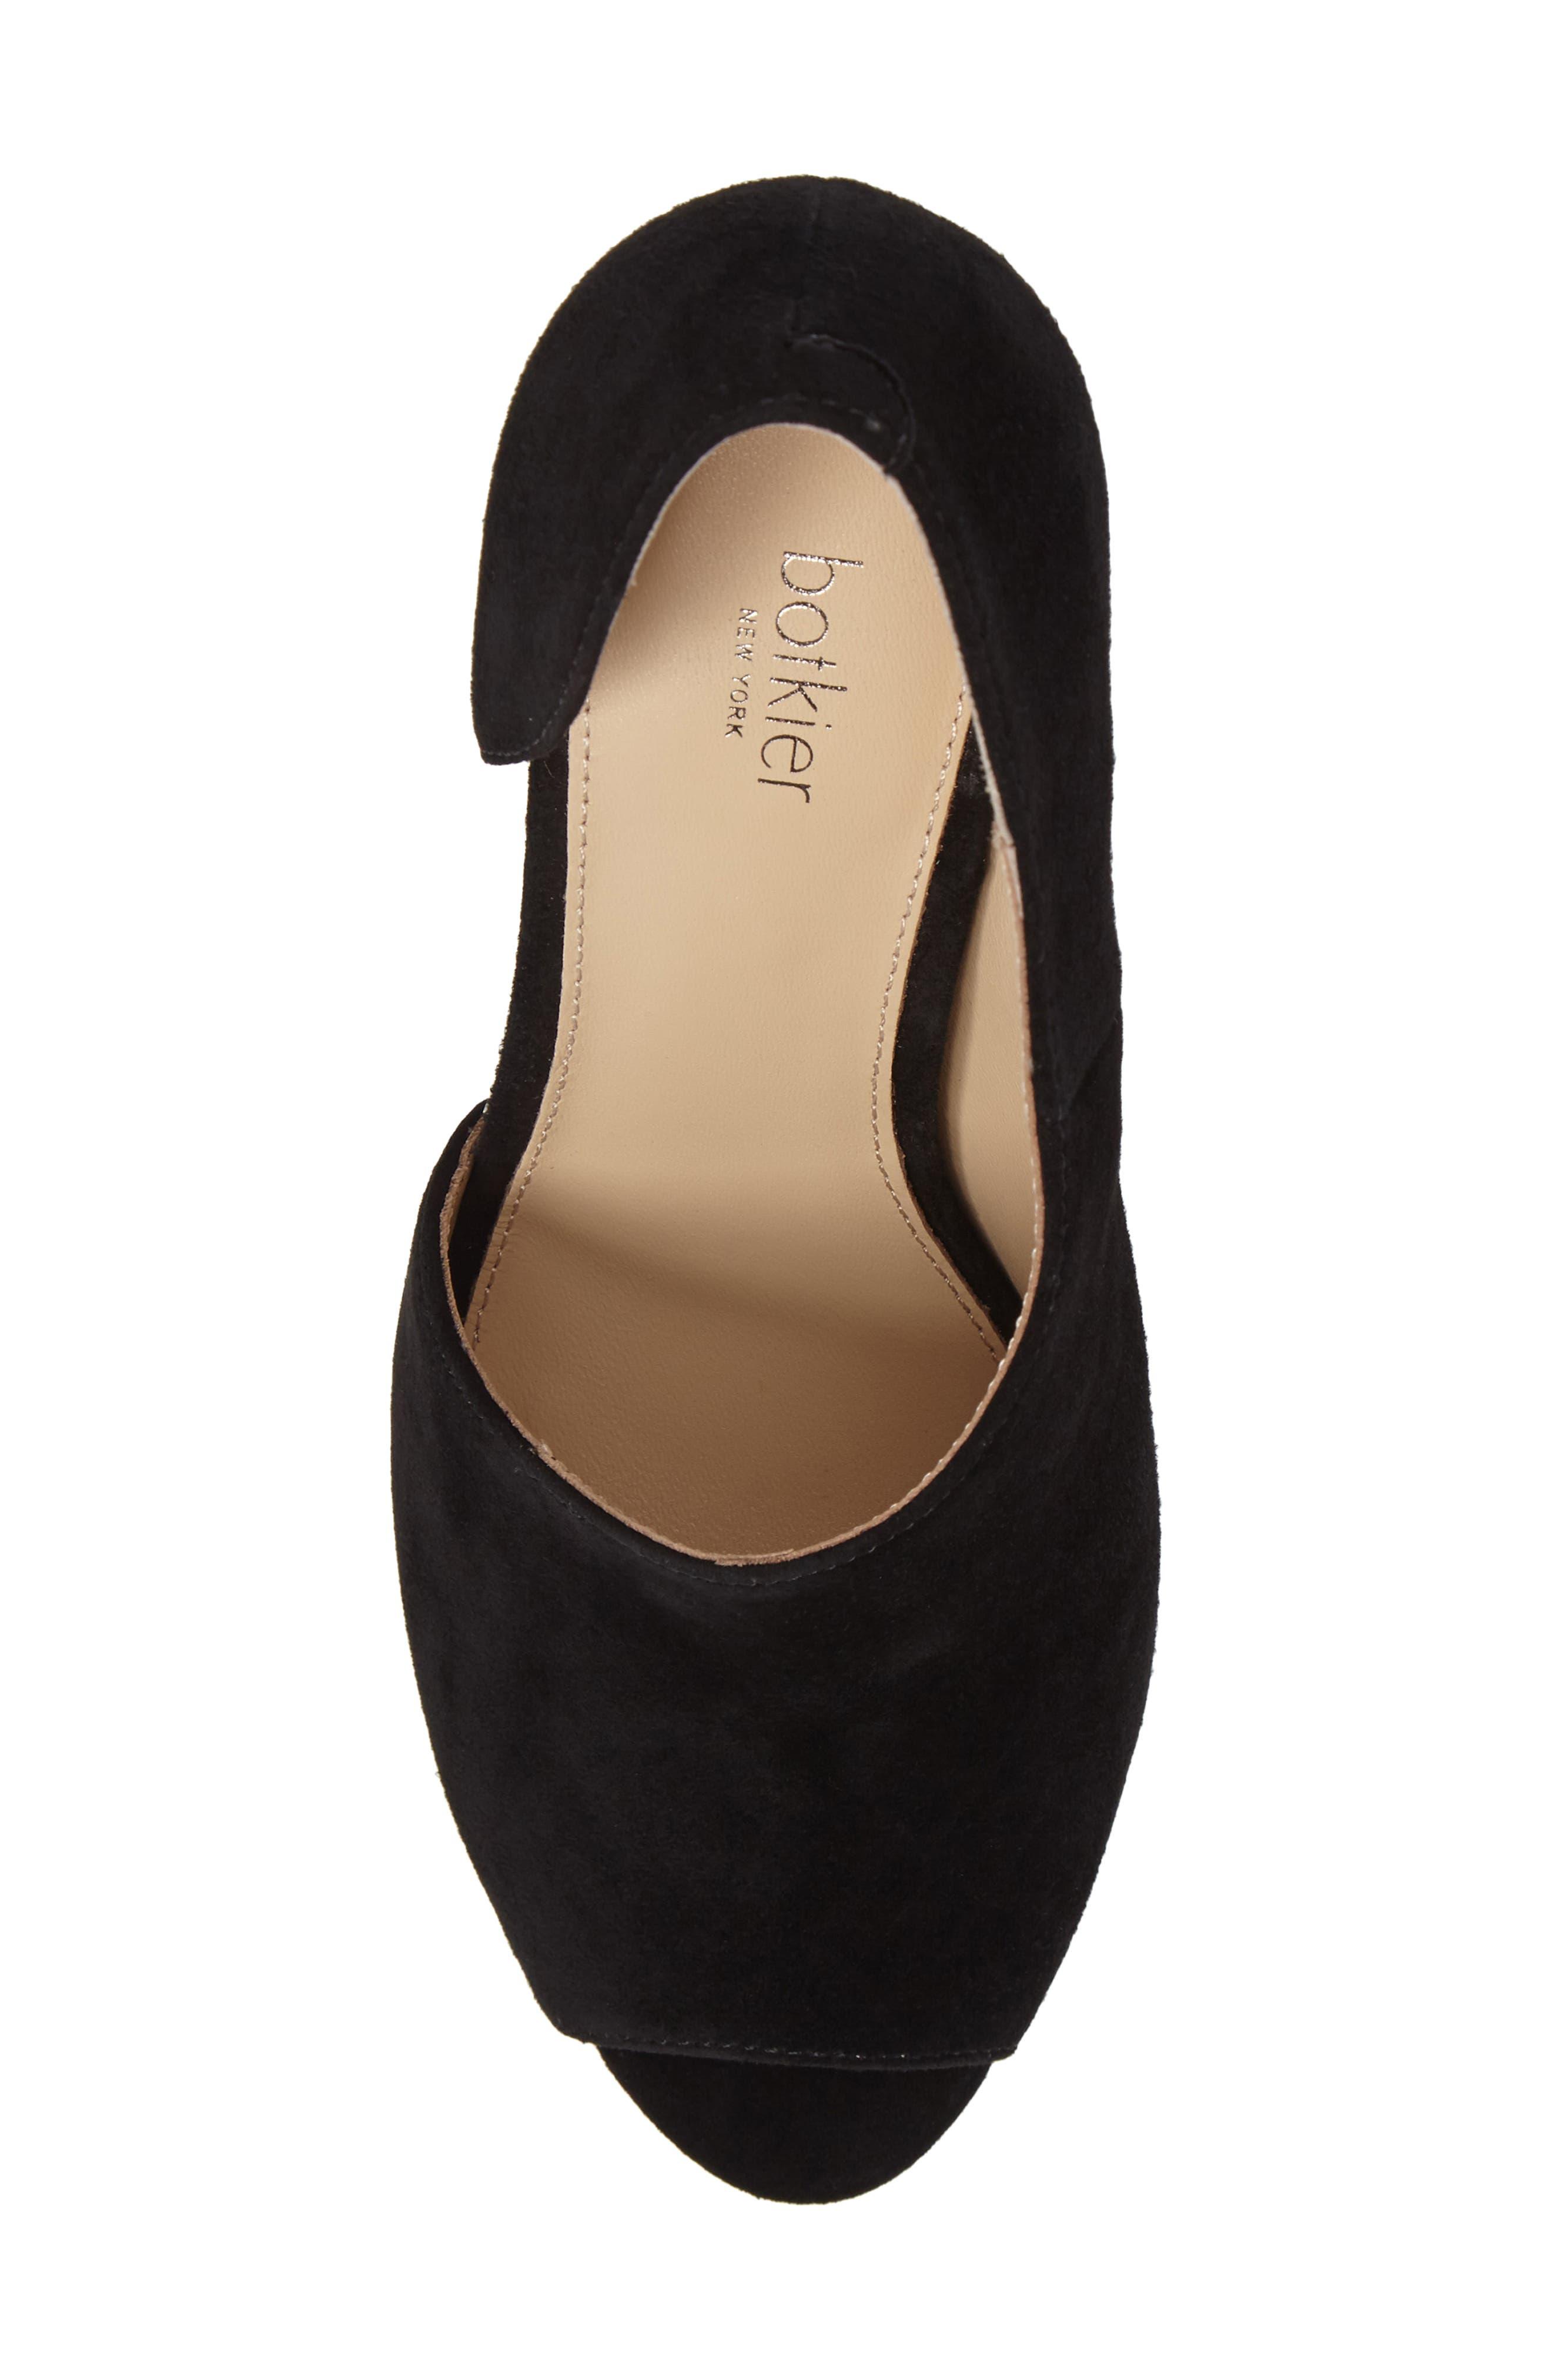 Adelia Asymmetrical Sandal,                             Alternate thumbnail 5, color,                             BLACK